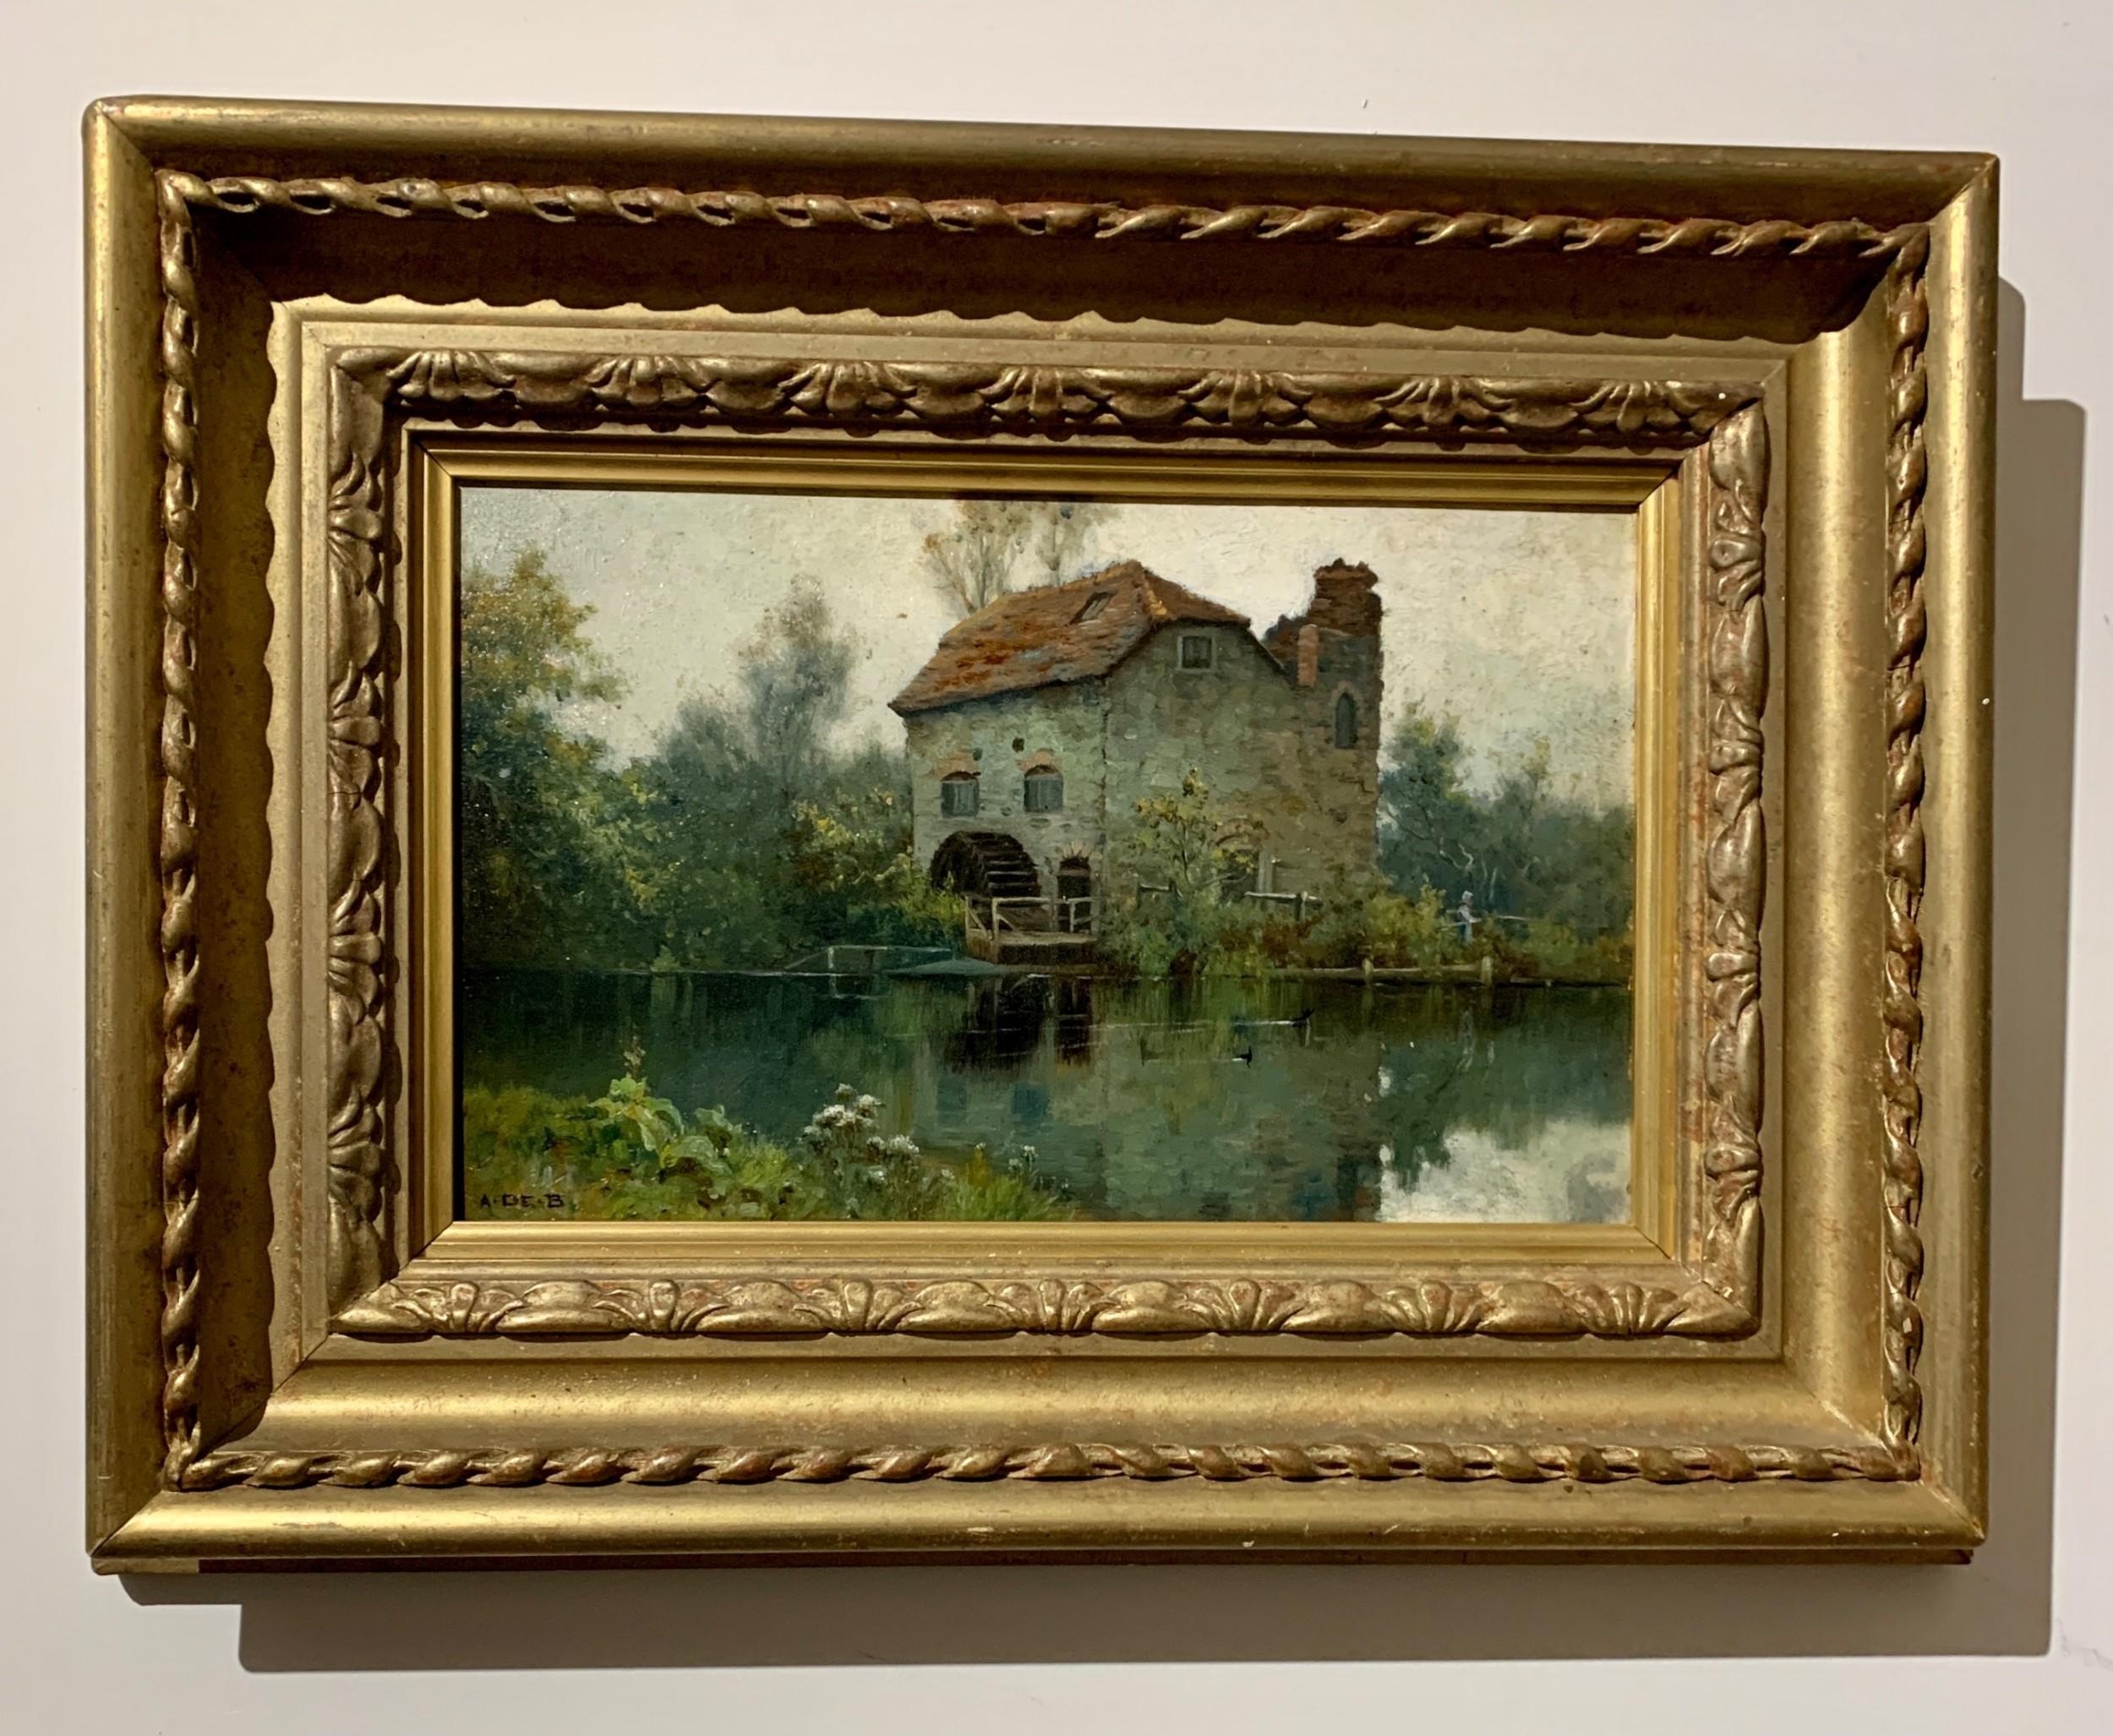 alfred de breanski junior antique english late 19thcentury victorian oil watermill with a landscape in surrey